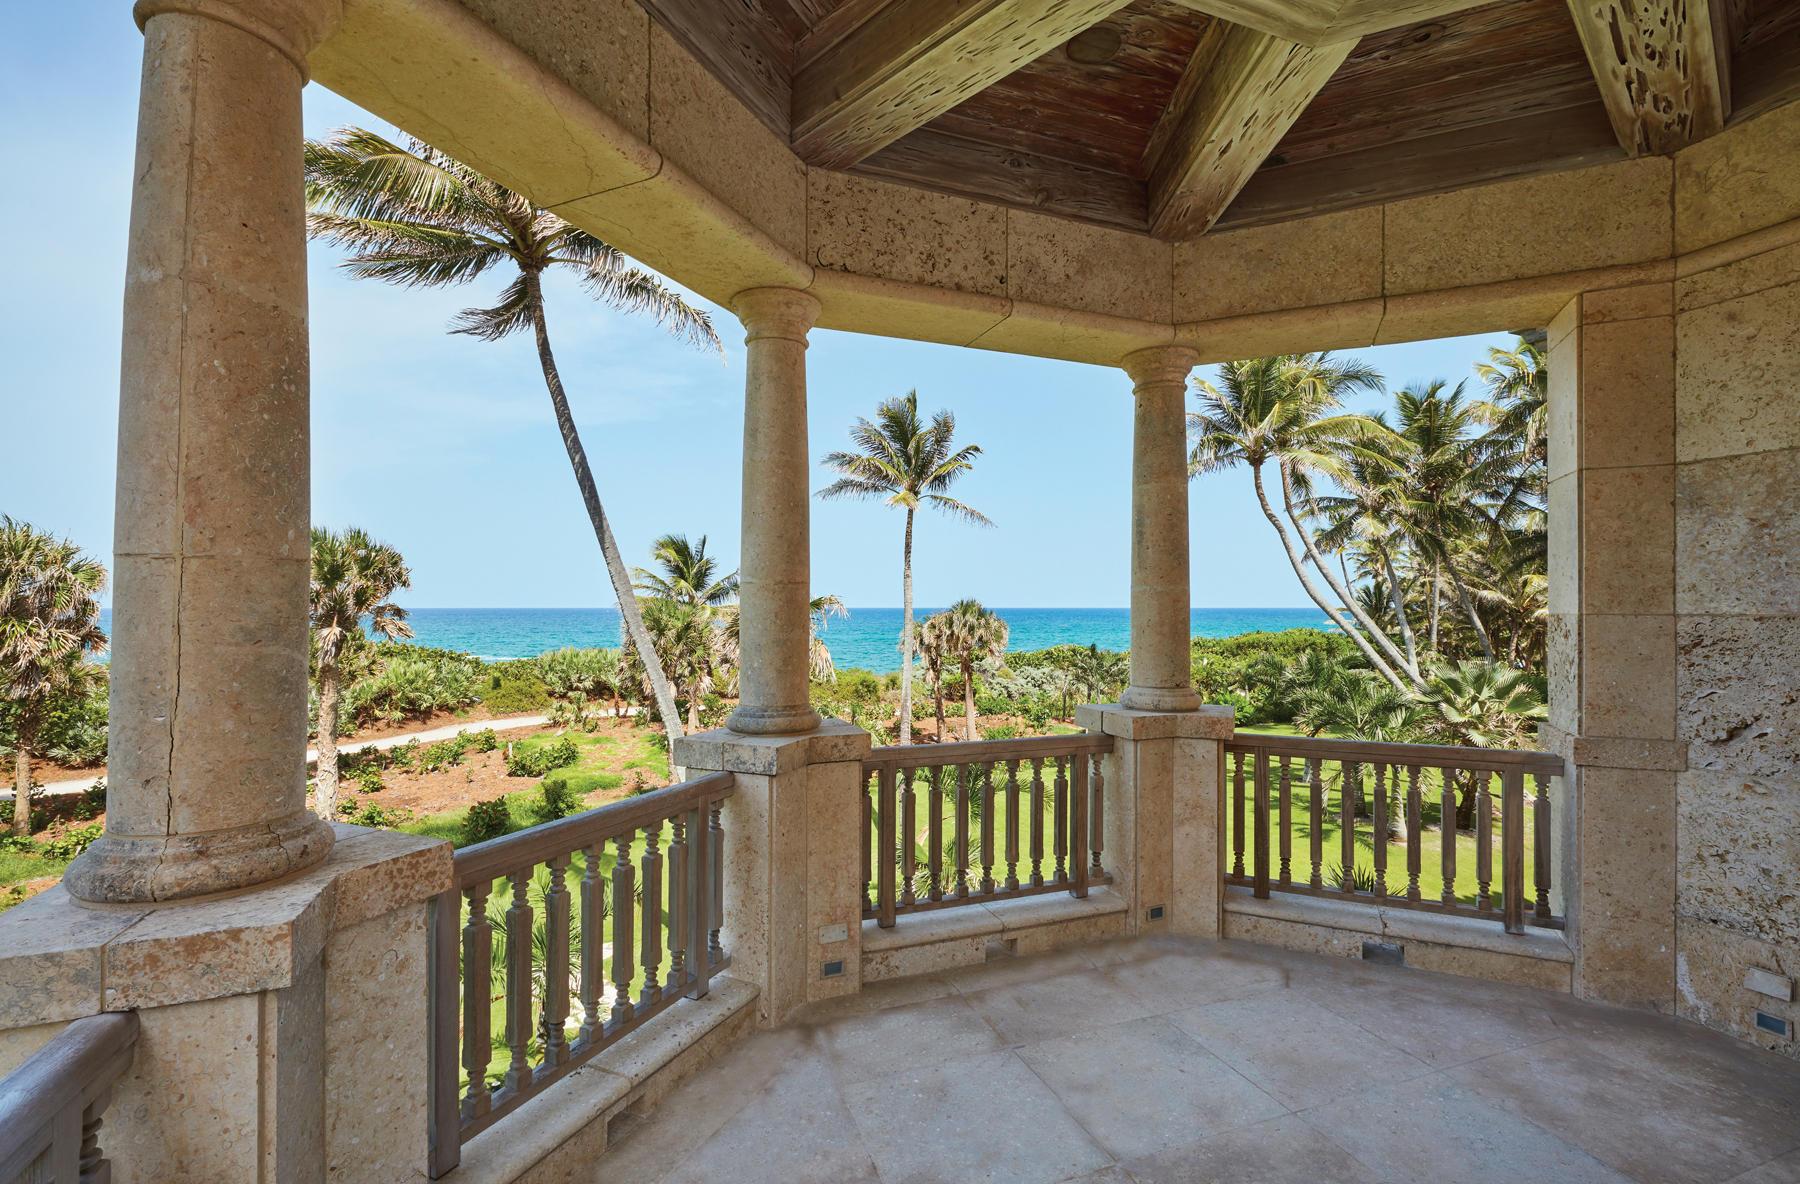 2000 Ocean Boulevard, Manalapan, Florida 33462, 33 Bedrooms Bedrooms, ,38.14 BathroomsBathrooms,Single Family Detached,For Sale,Ocean,RX-10335802